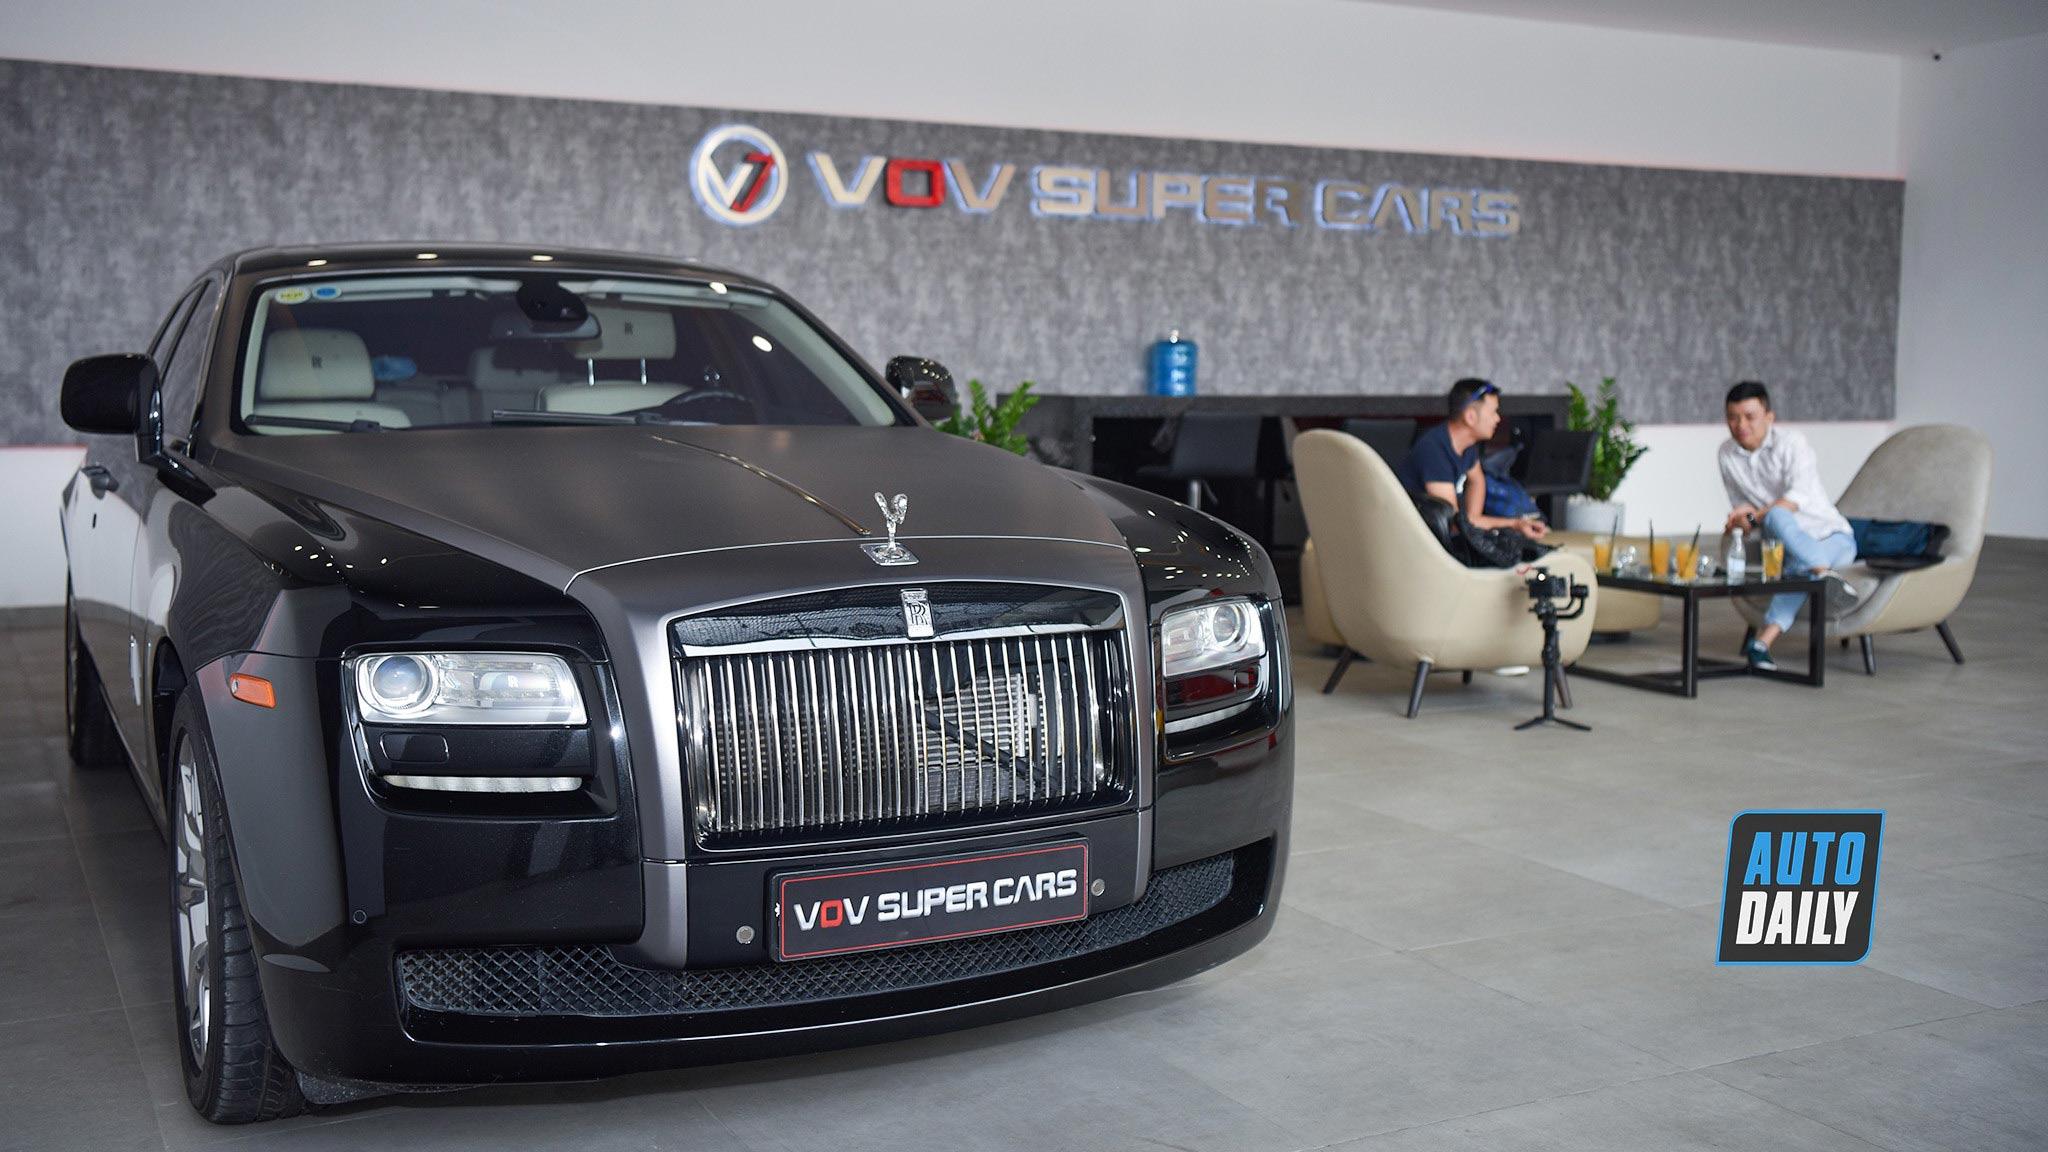 12 tỷ, chọn Rolls Royce Ghost cũ hay Mercedes Maybach S450?